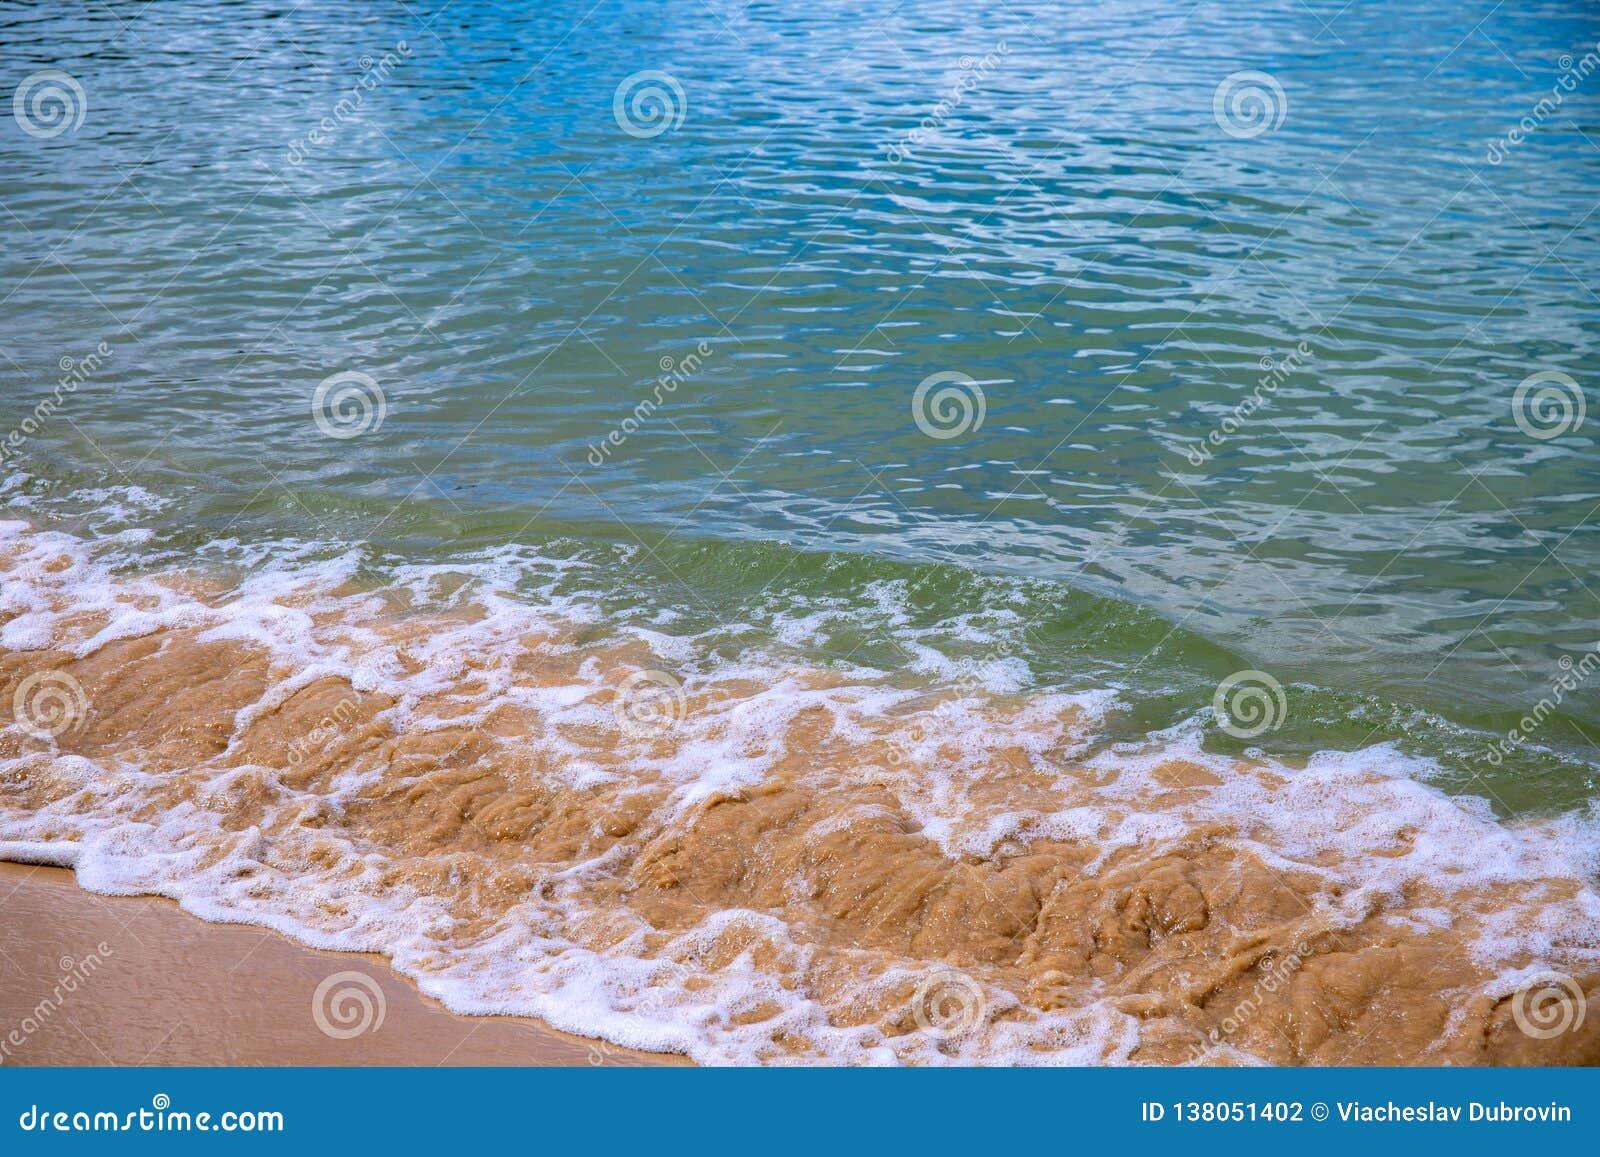 Sea Water Tide Over Yellow Sand Beach. Tropical Seaside